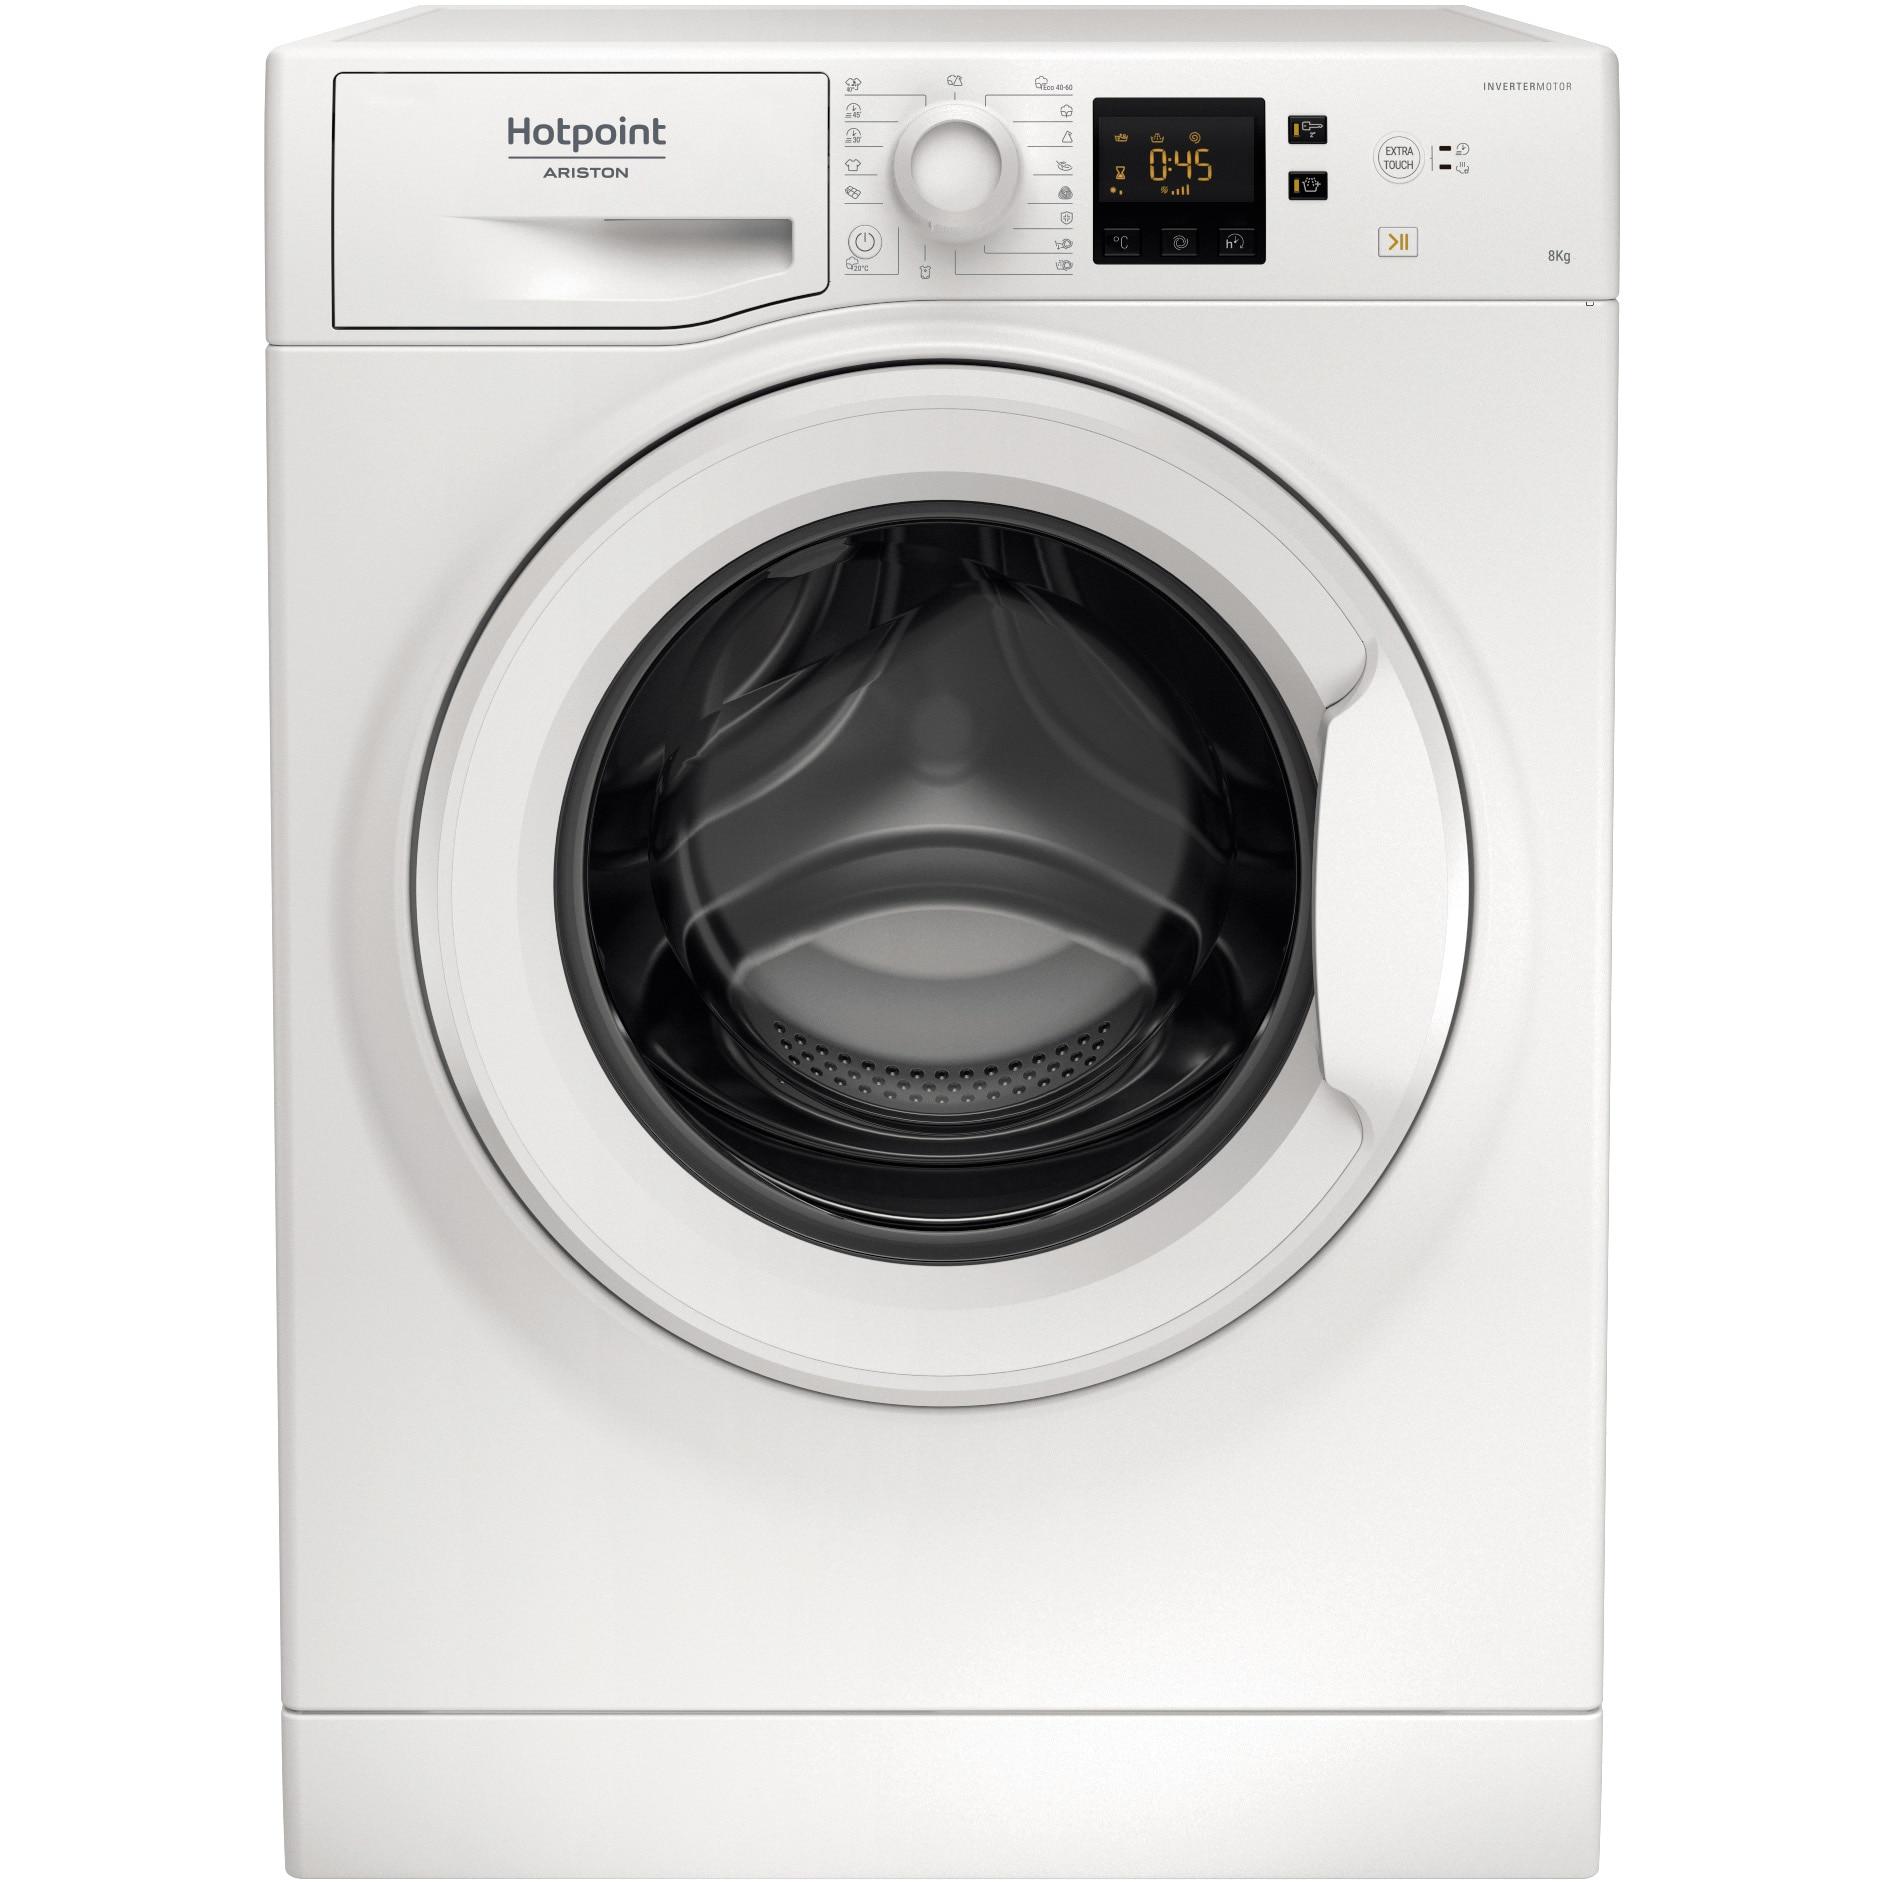 Fotografie Masina de spalat rufe Hotpoint NS823CWEUN, 8 kg, 1200 RPM, Clasa A+++, Motor Inverter, Steam Hygiene, Wool Hand Wash Safe, Alb